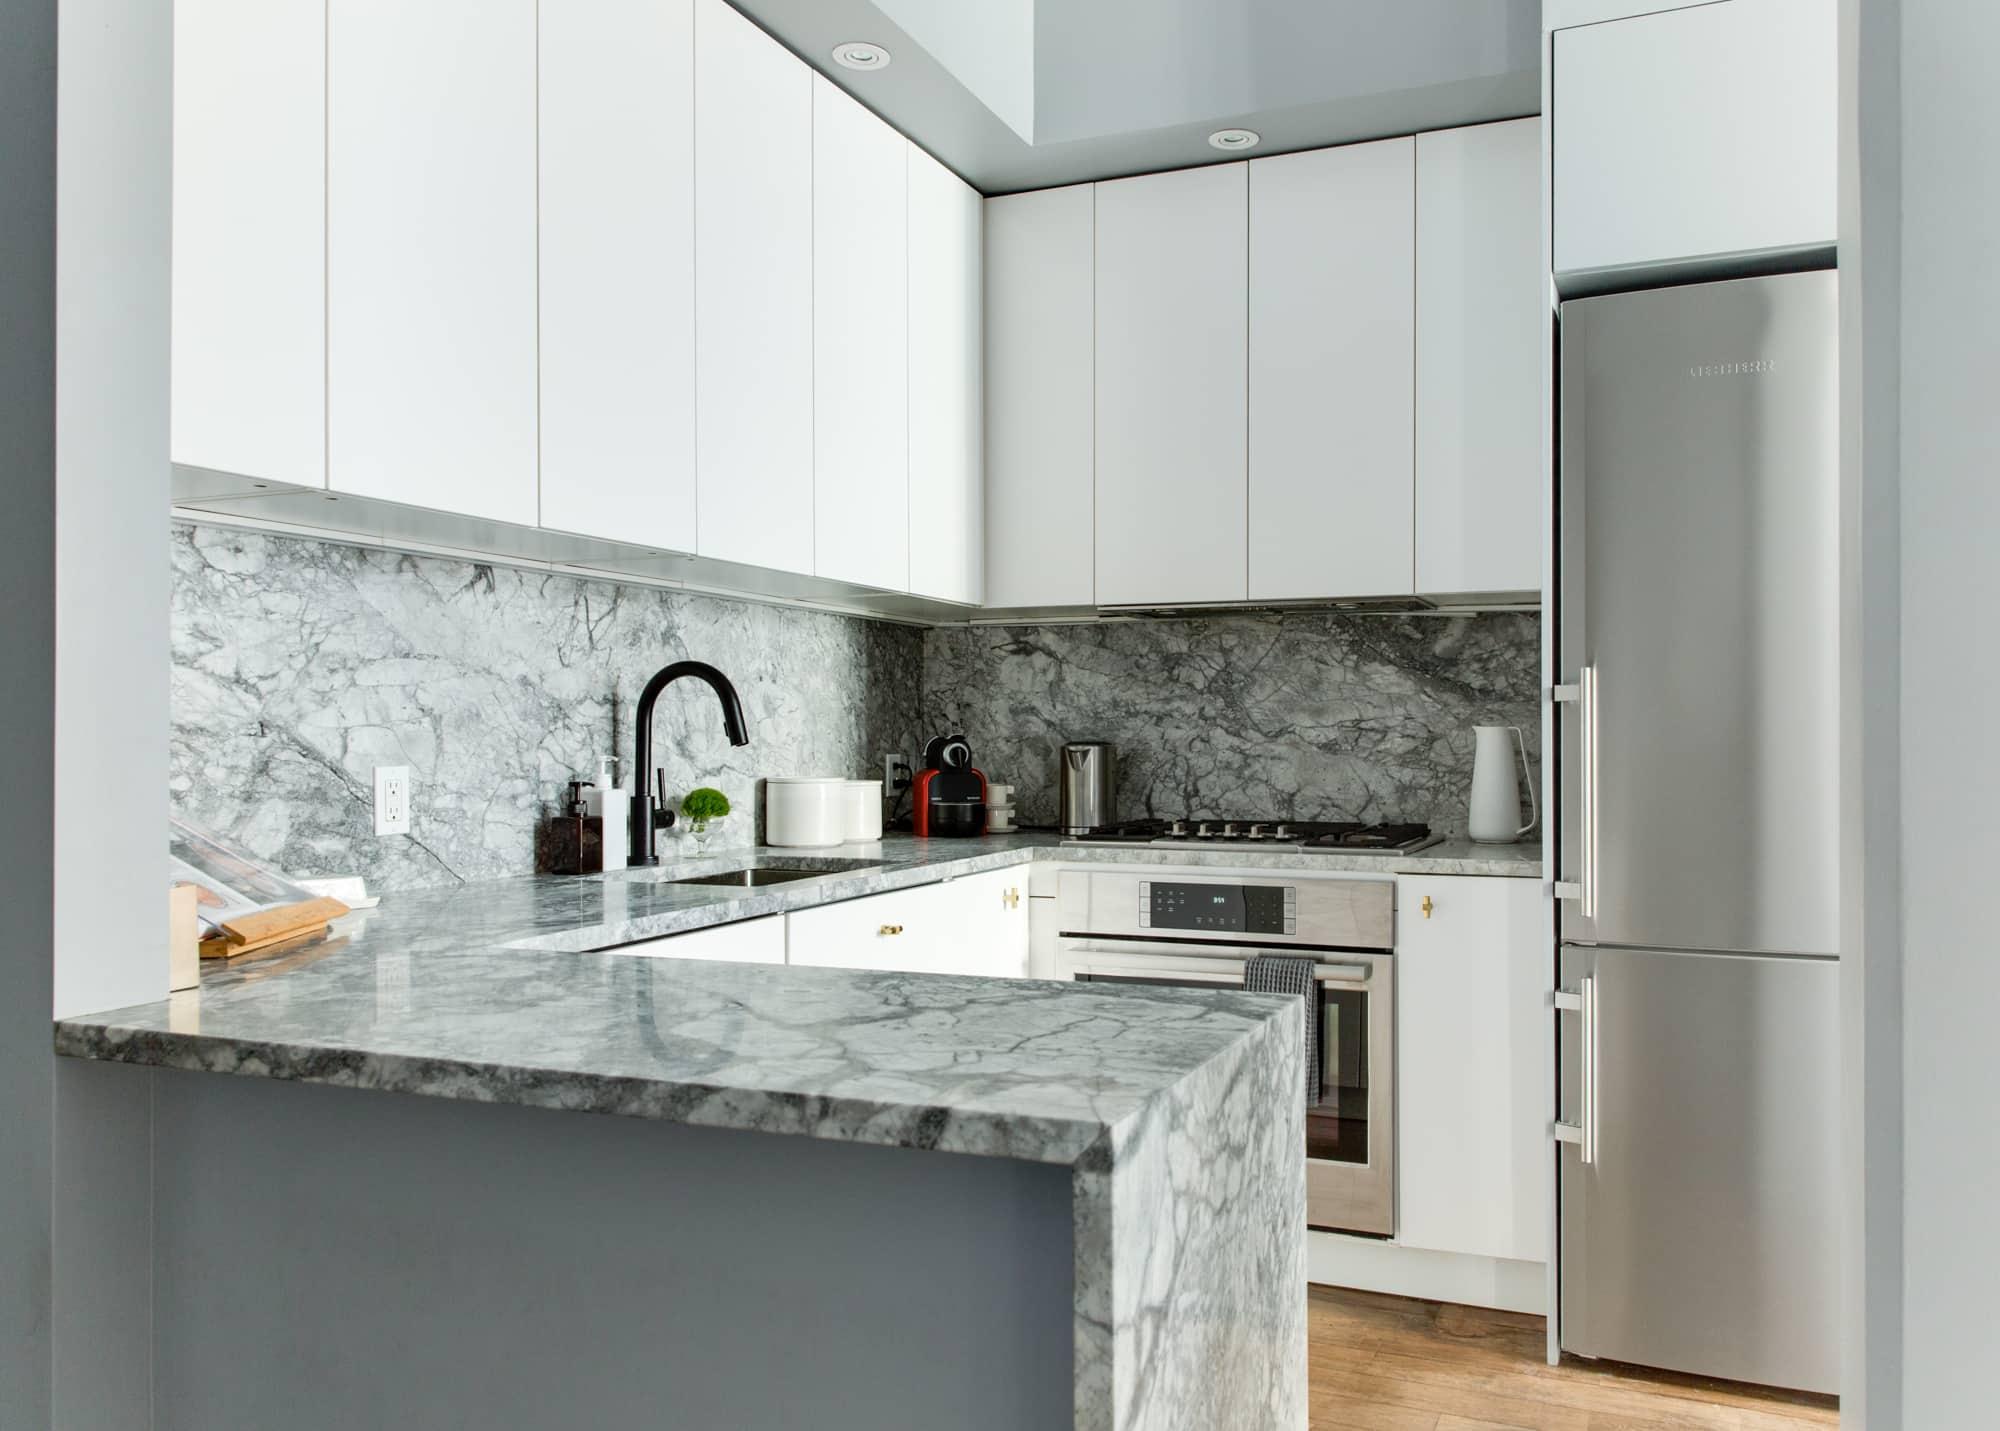 Kitchen Backsplash - Tile Ideas, Pictures, Designs ...